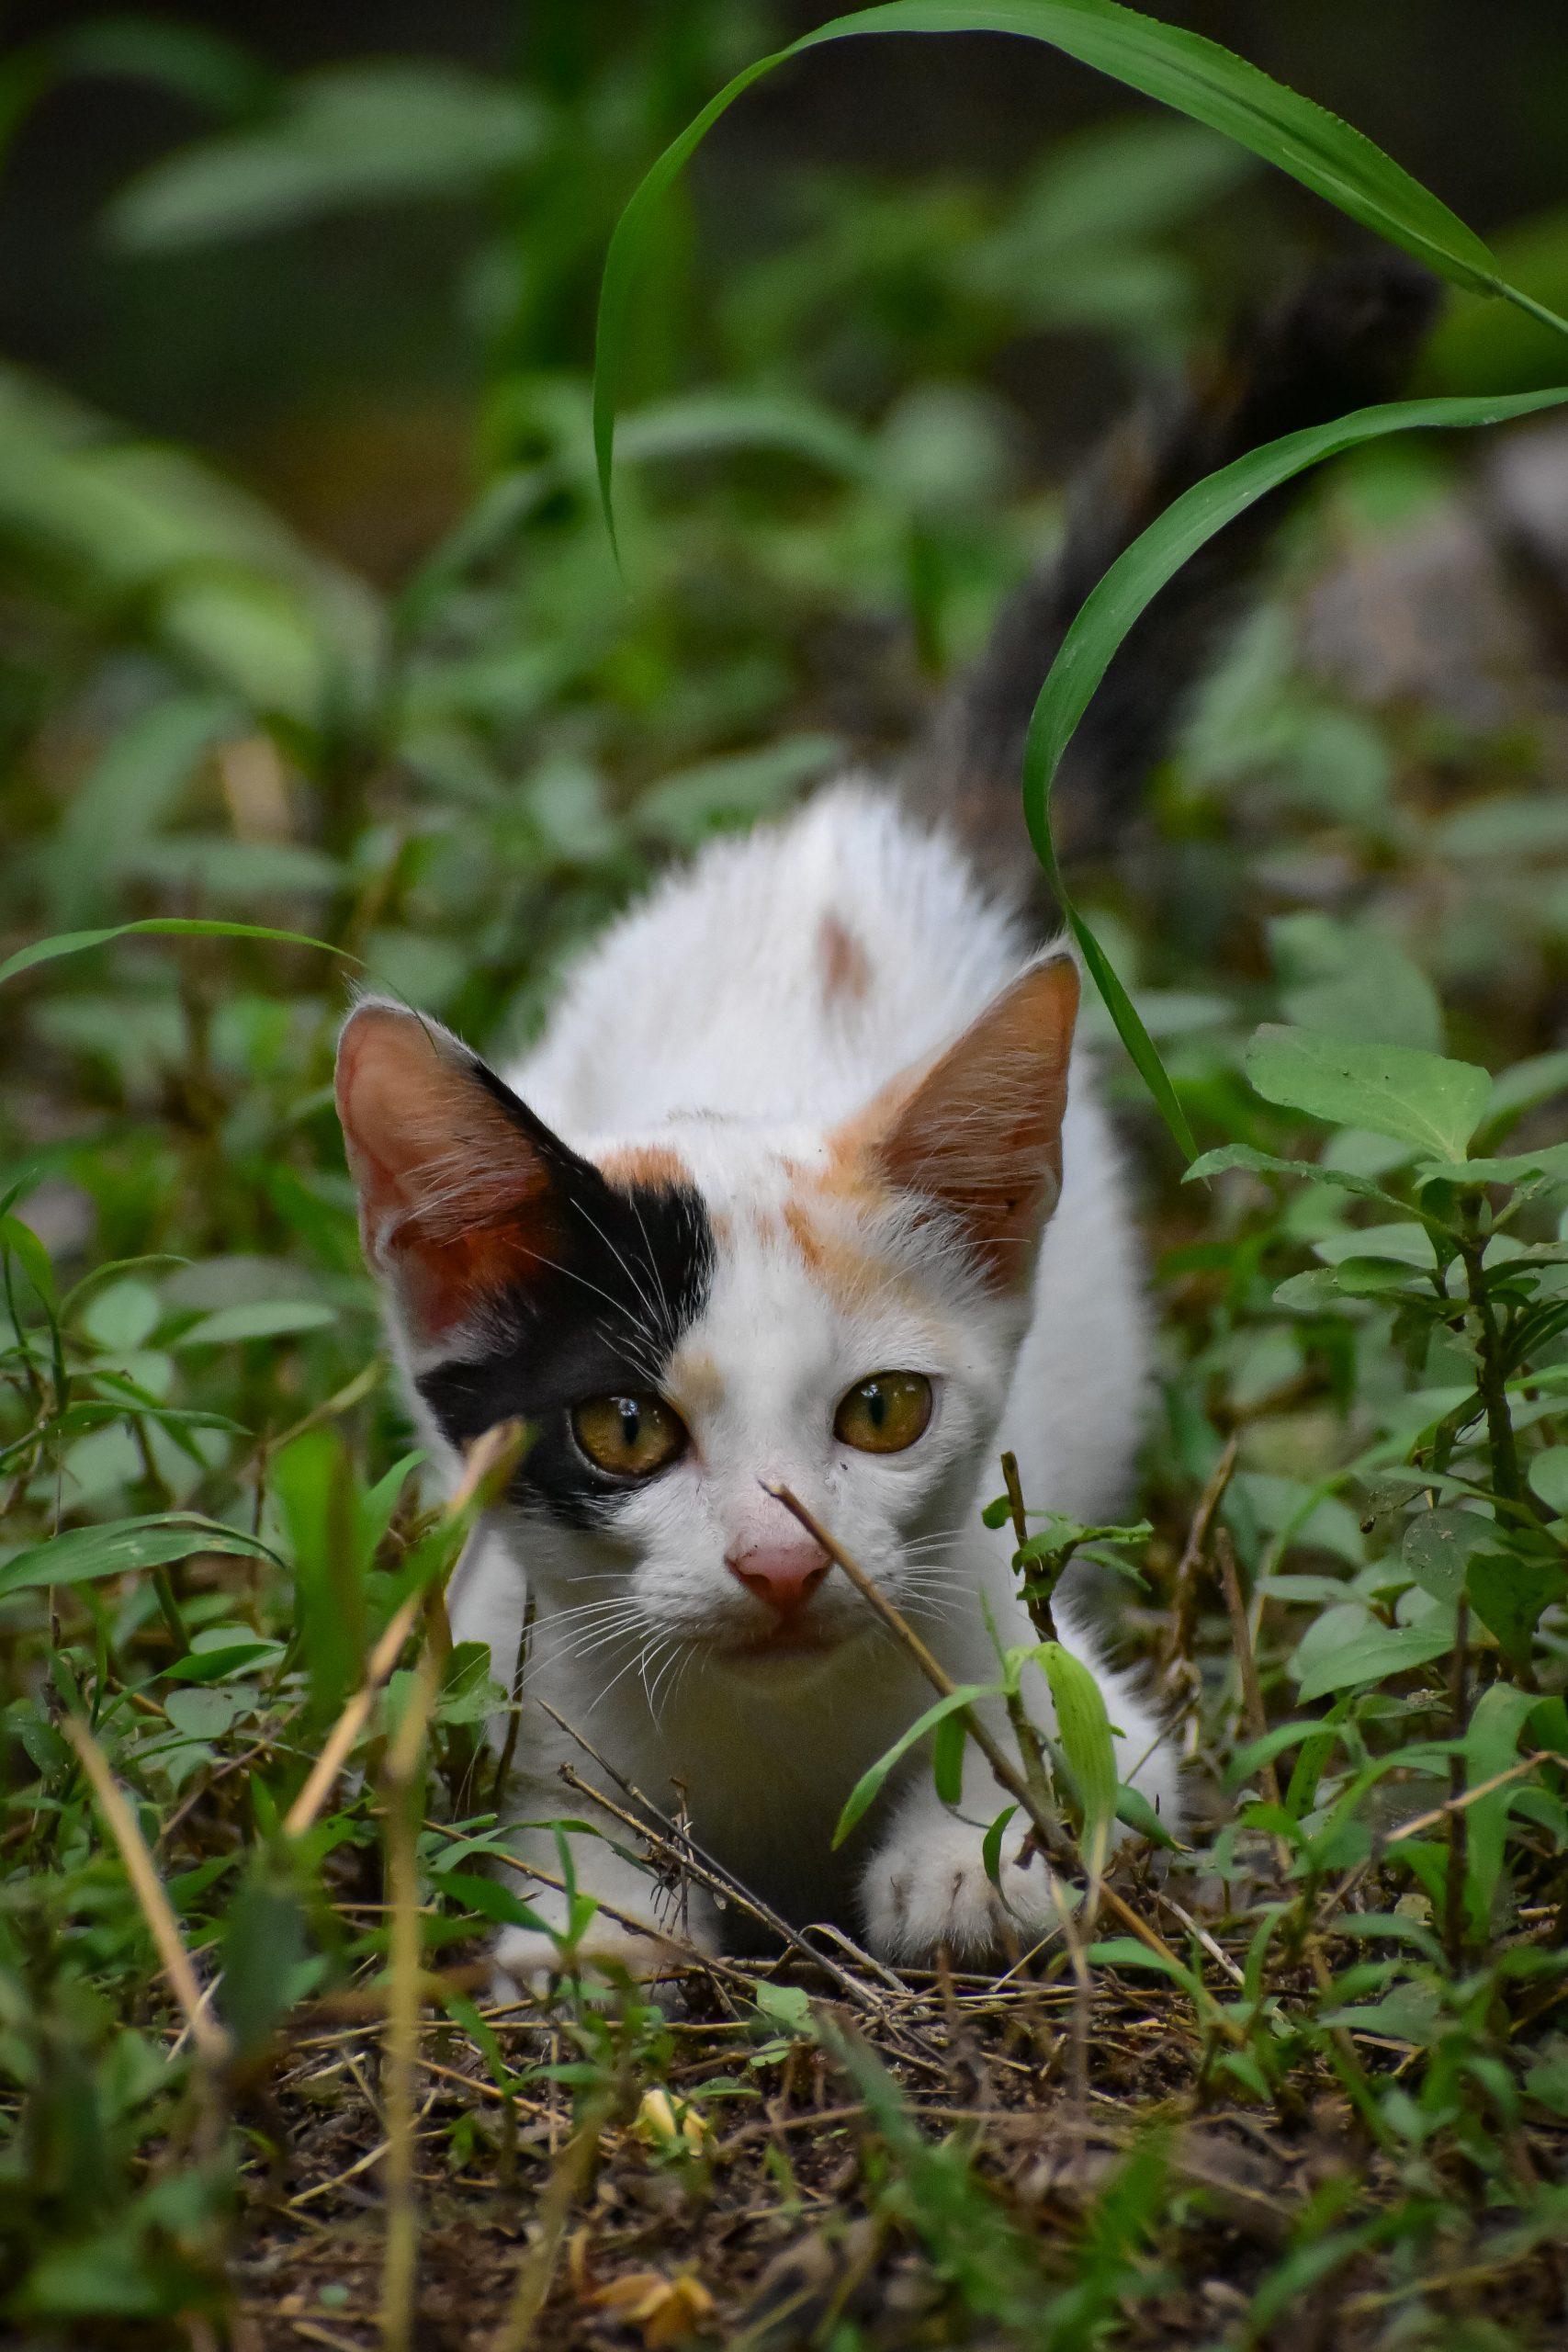 Kitten with Yellow Eyes